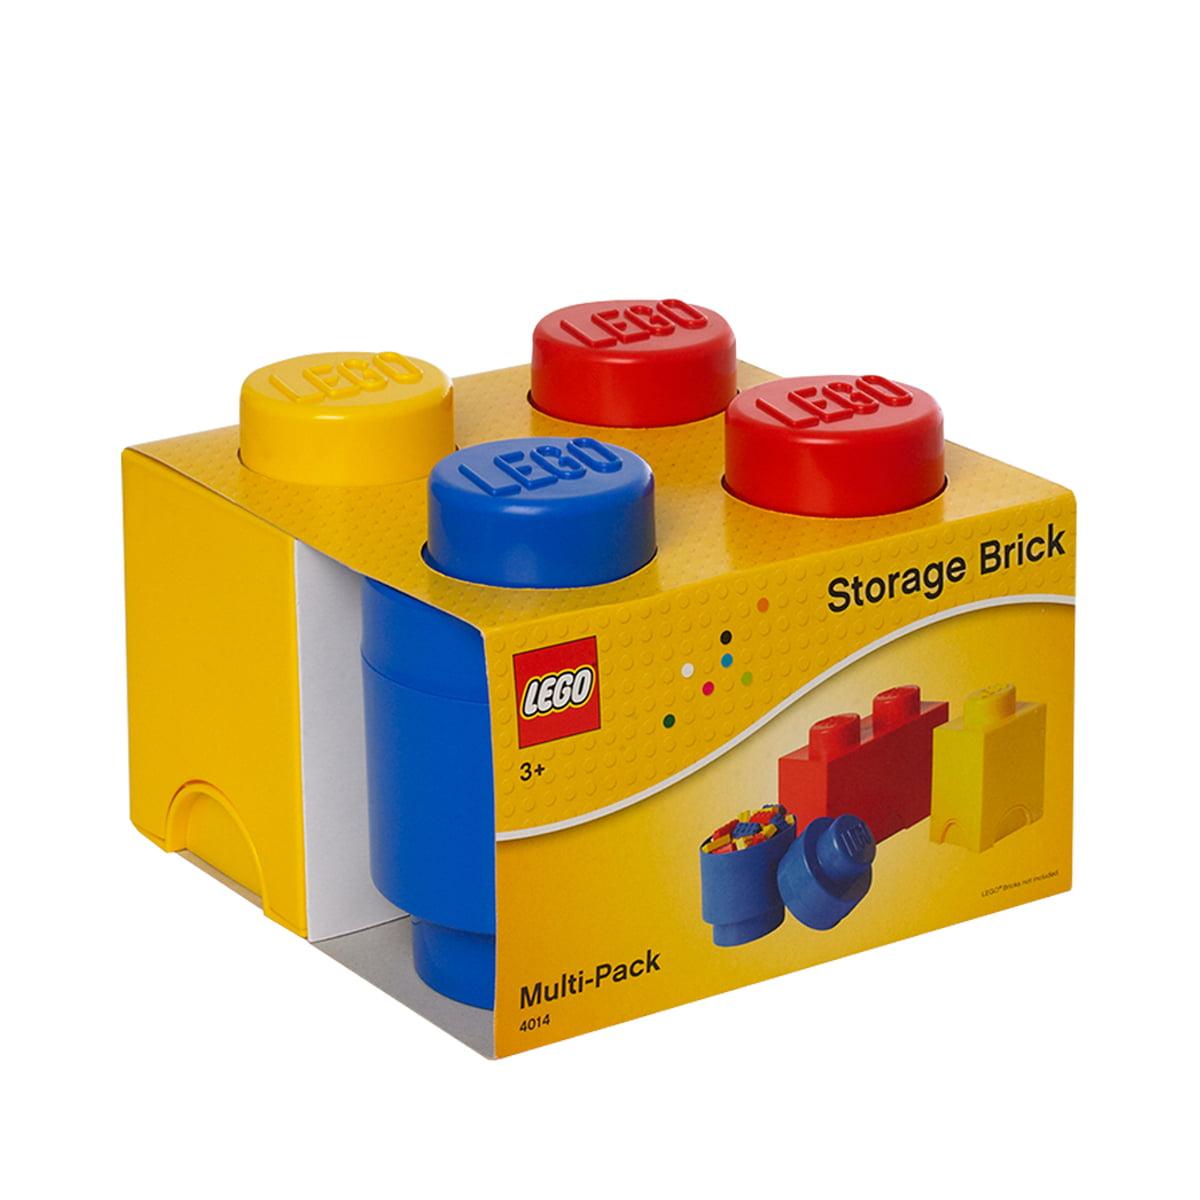 Charmant Lego   Storage Brick Multipack Set Of 3